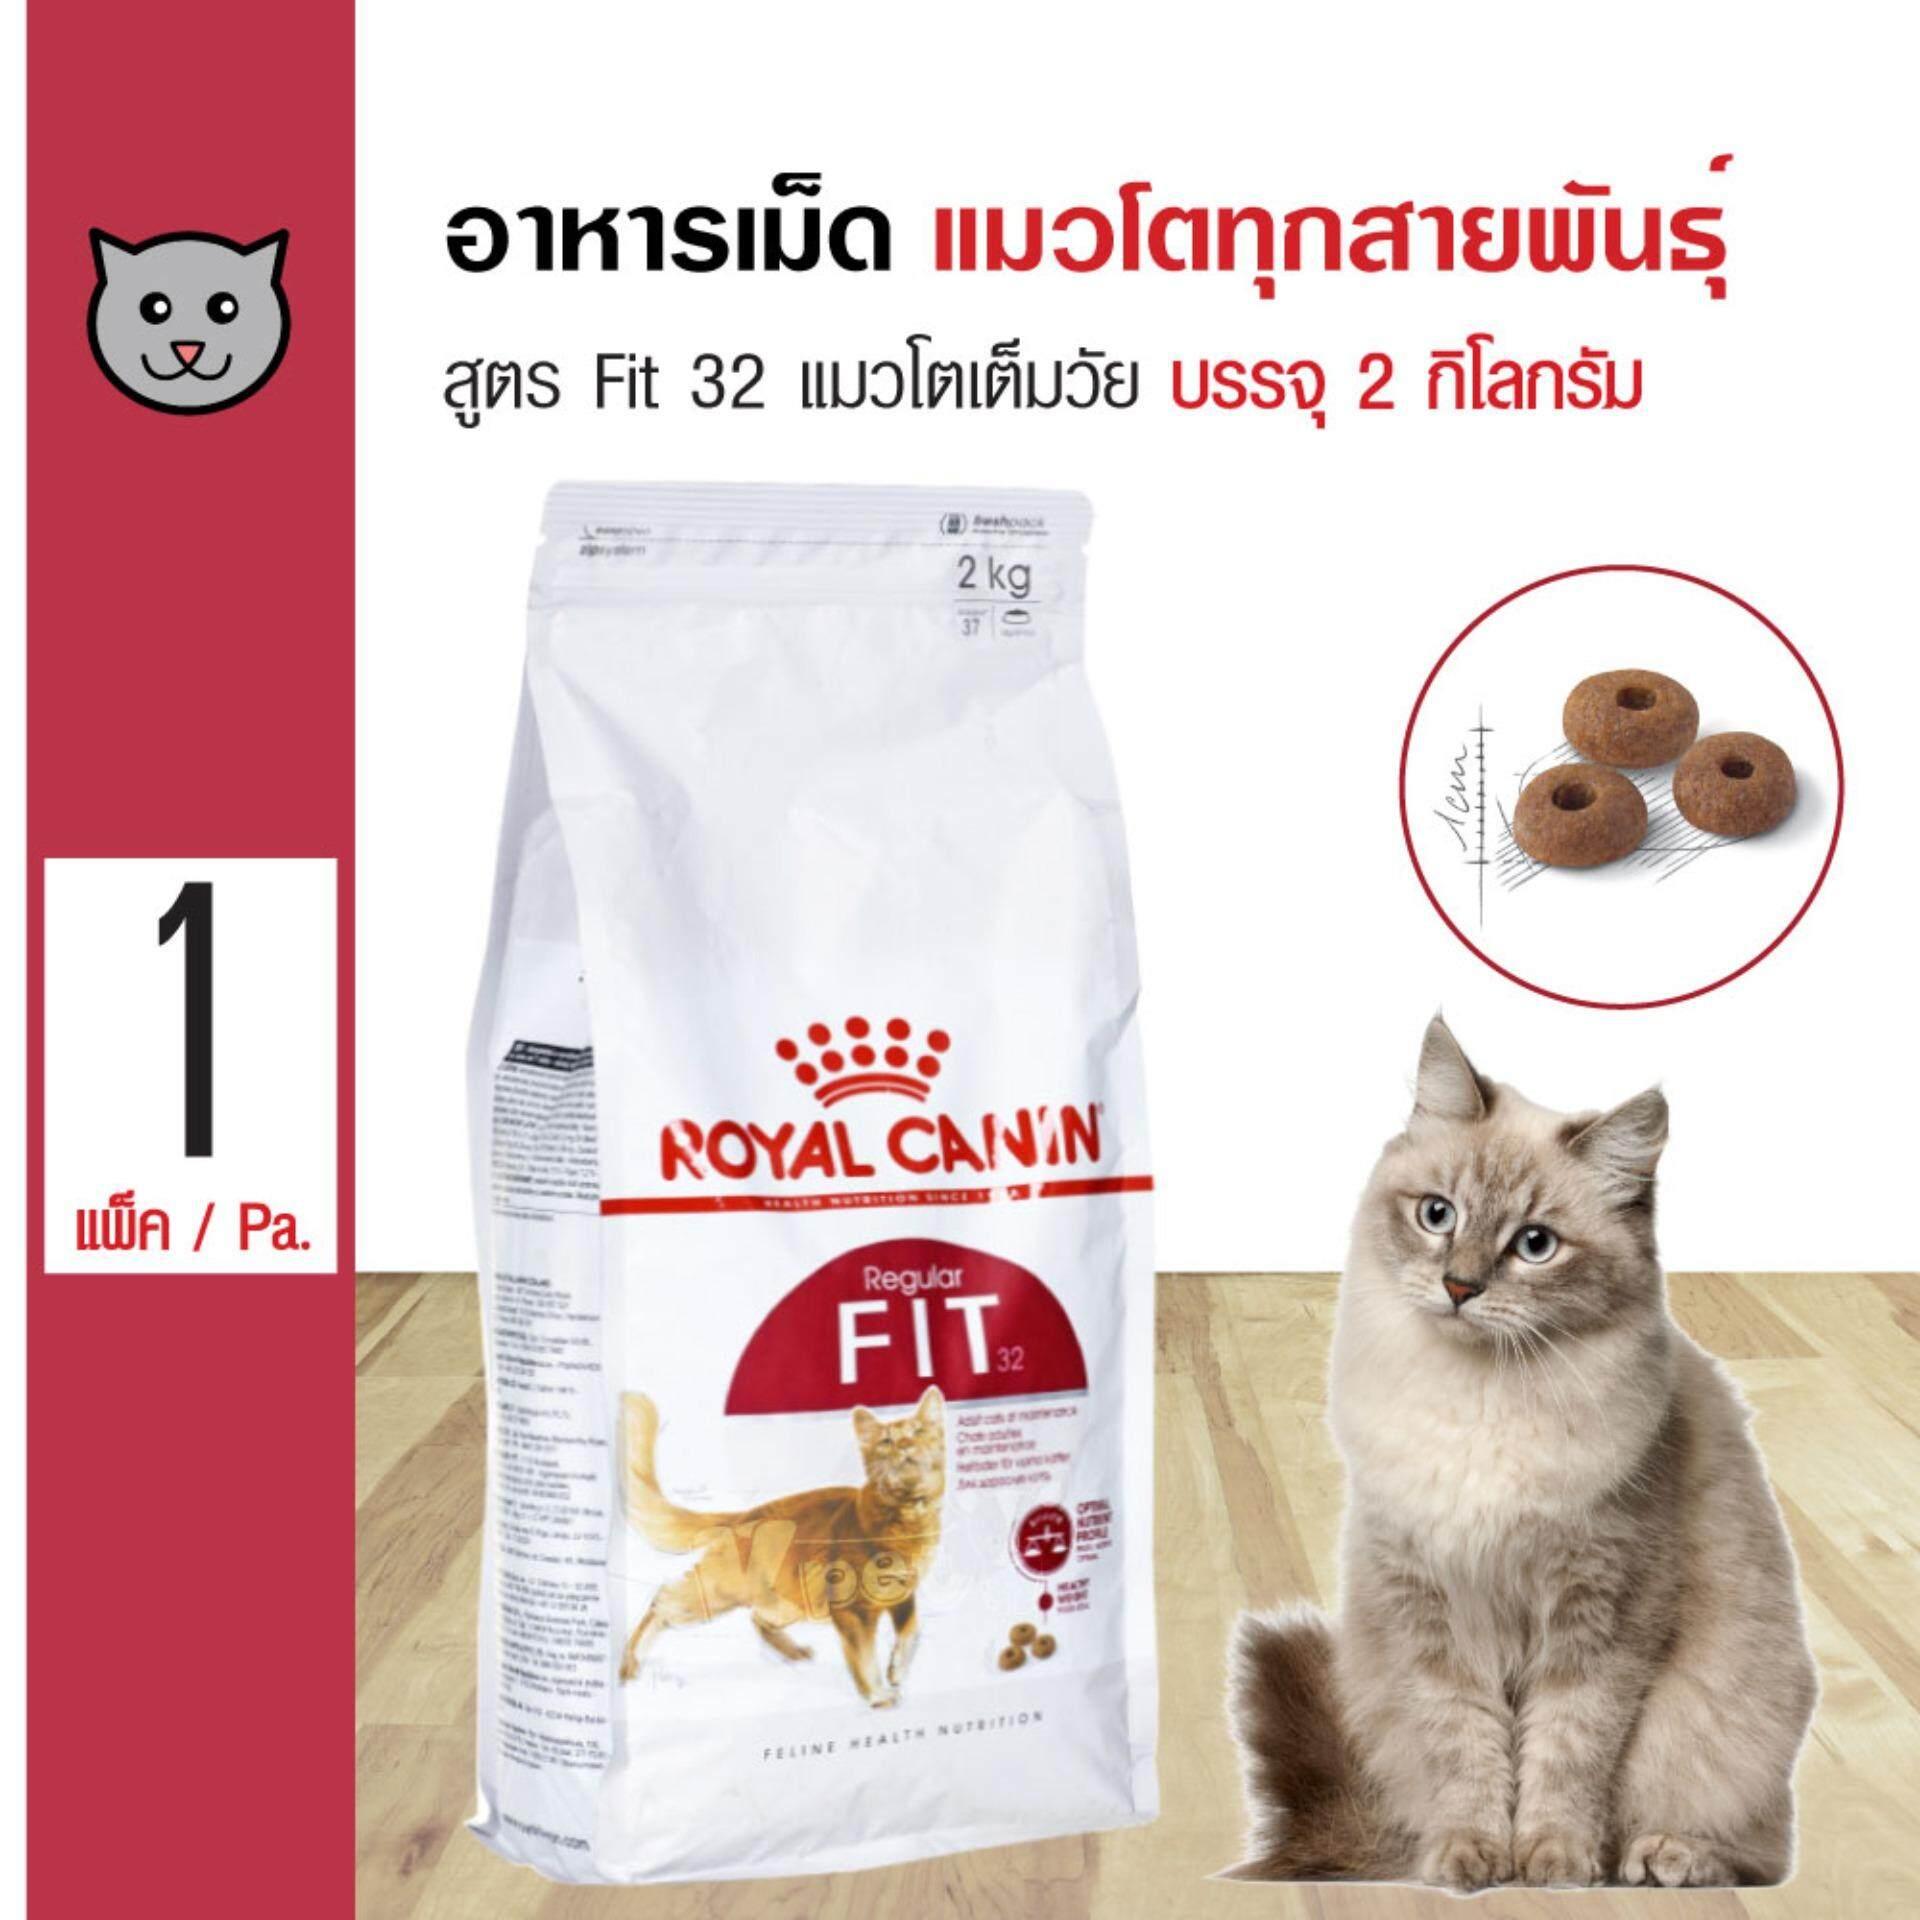 Royal Canin Fit 32 อาหารแมว สูตรแมวโตเต็มวัย บำรุงขน กล้ามเนื้อ สำหรับแมวโตทุกสายพันธุ์ (2 กิโลกรัม/ถุง) By Kpet.